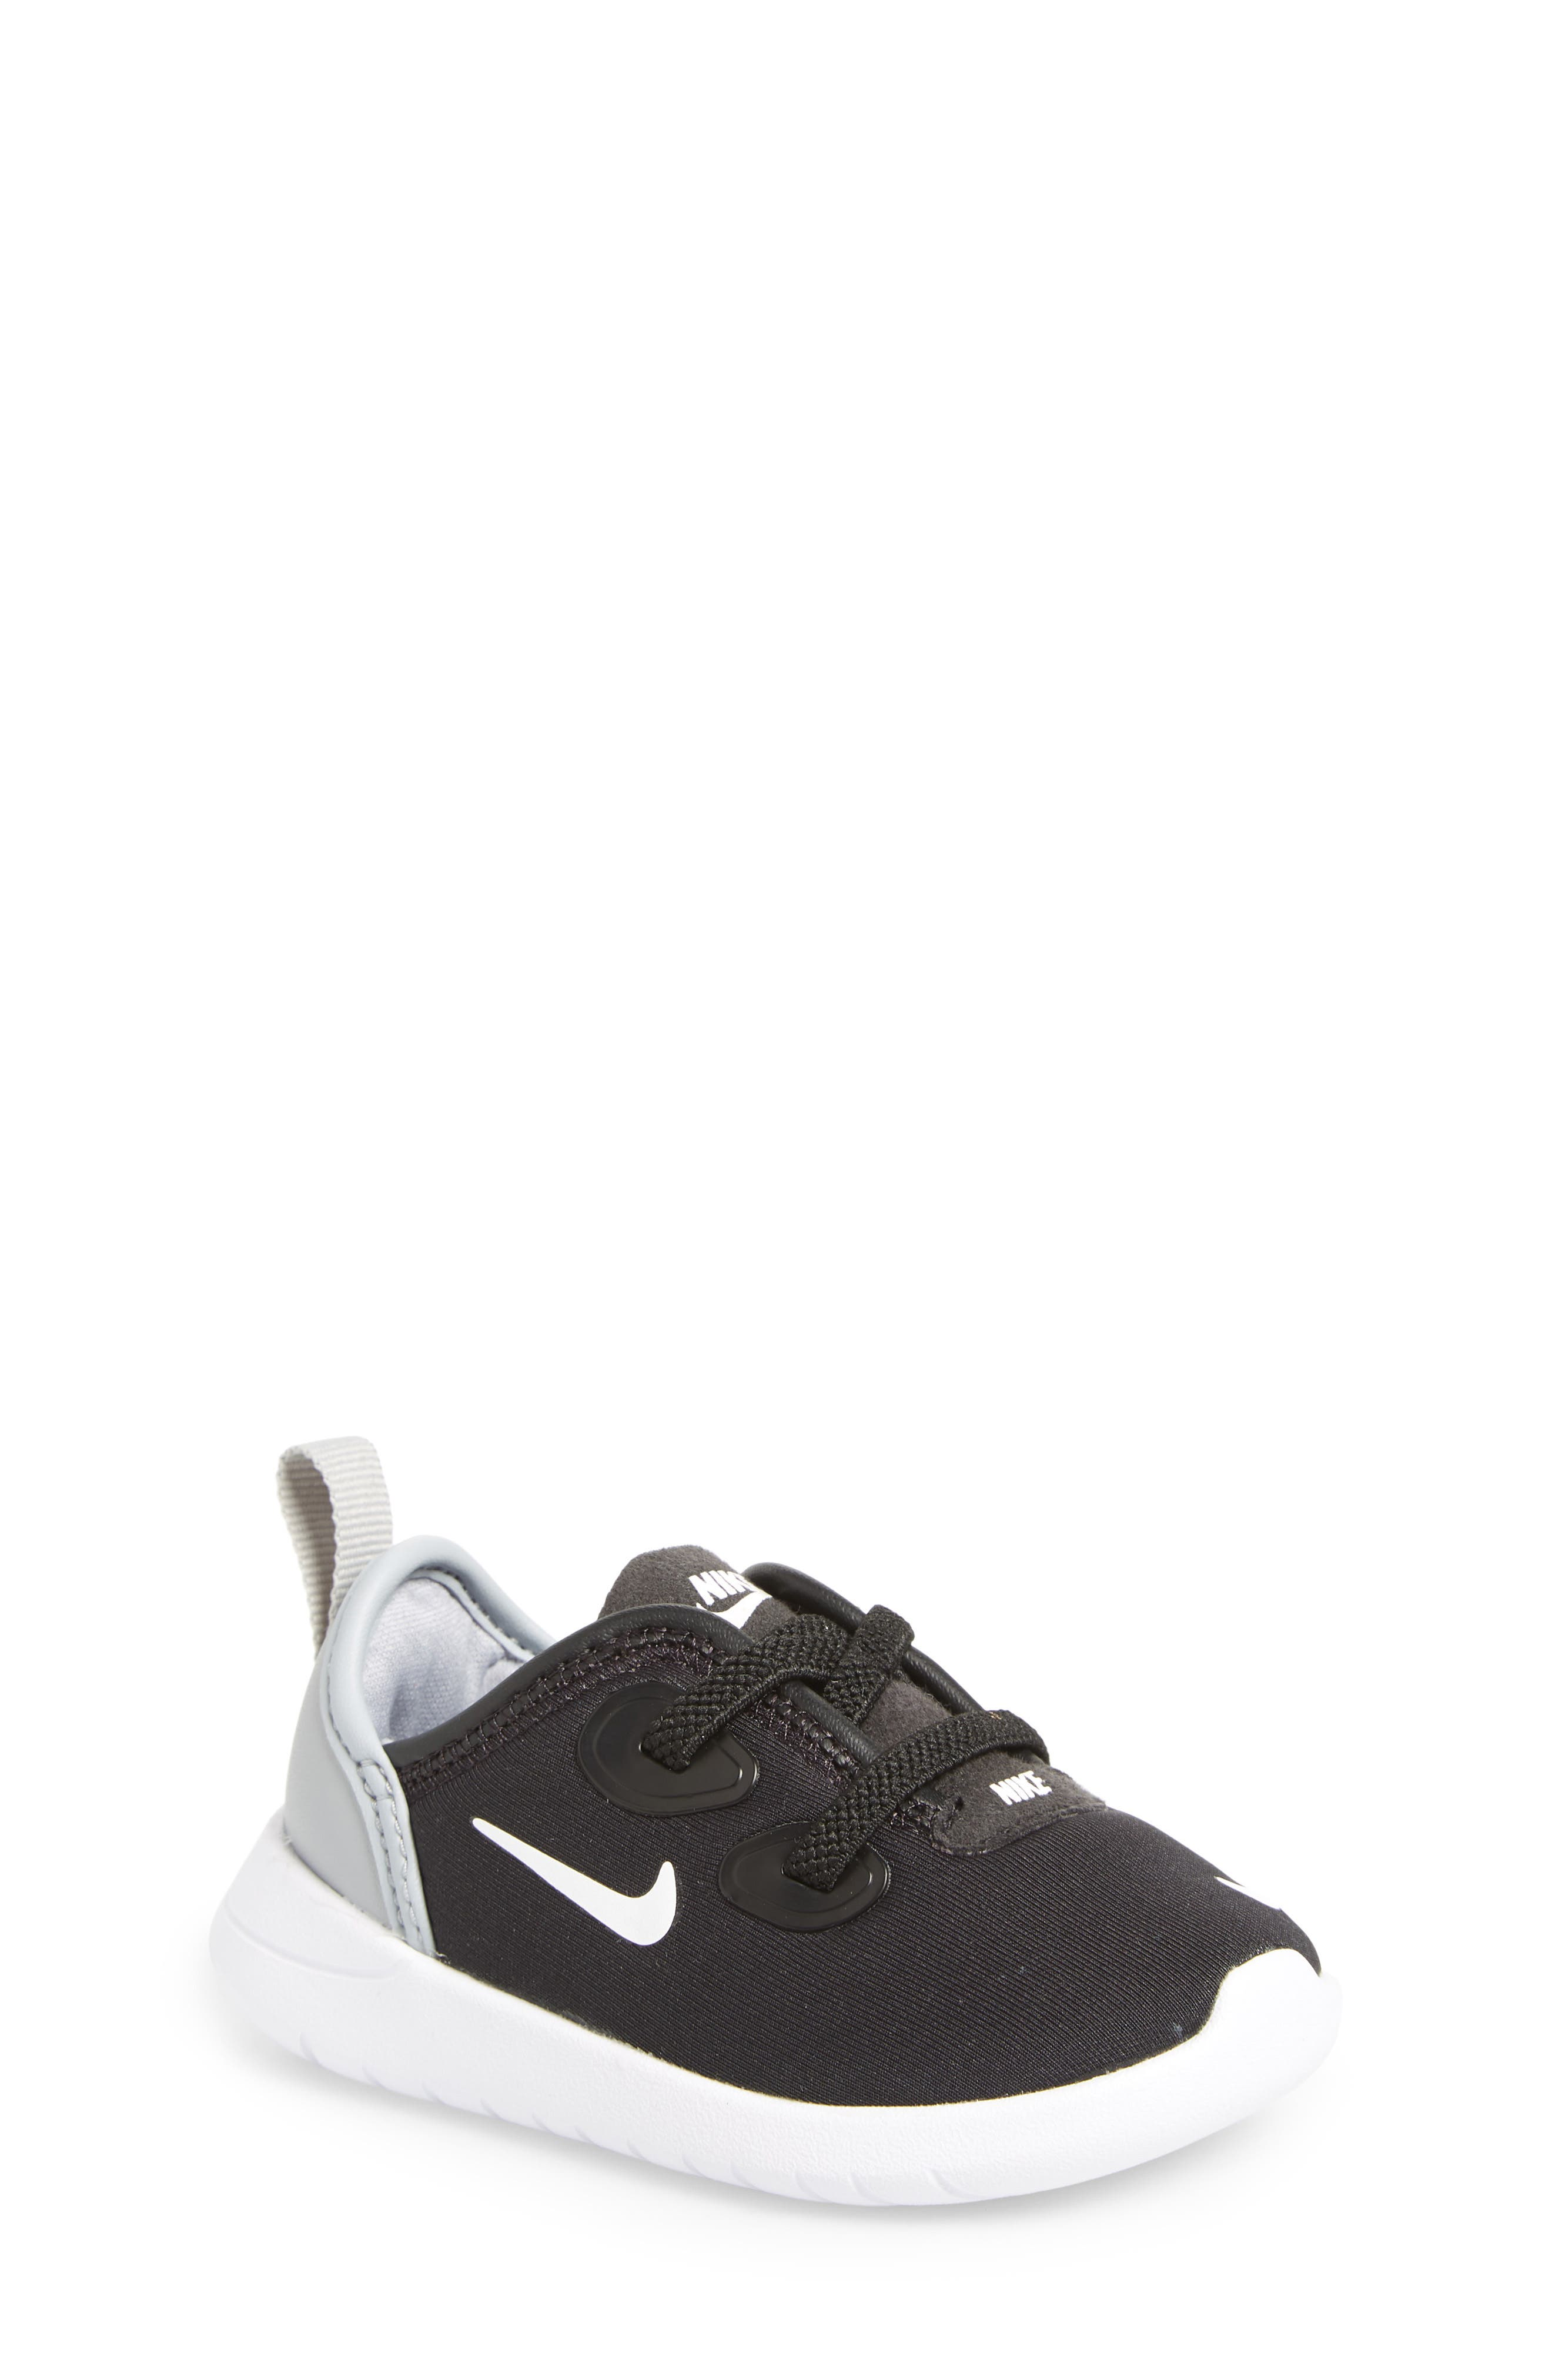 Hakata Sneaker,                             Main thumbnail 1, color,                             Black/ White/ Wolf Grey